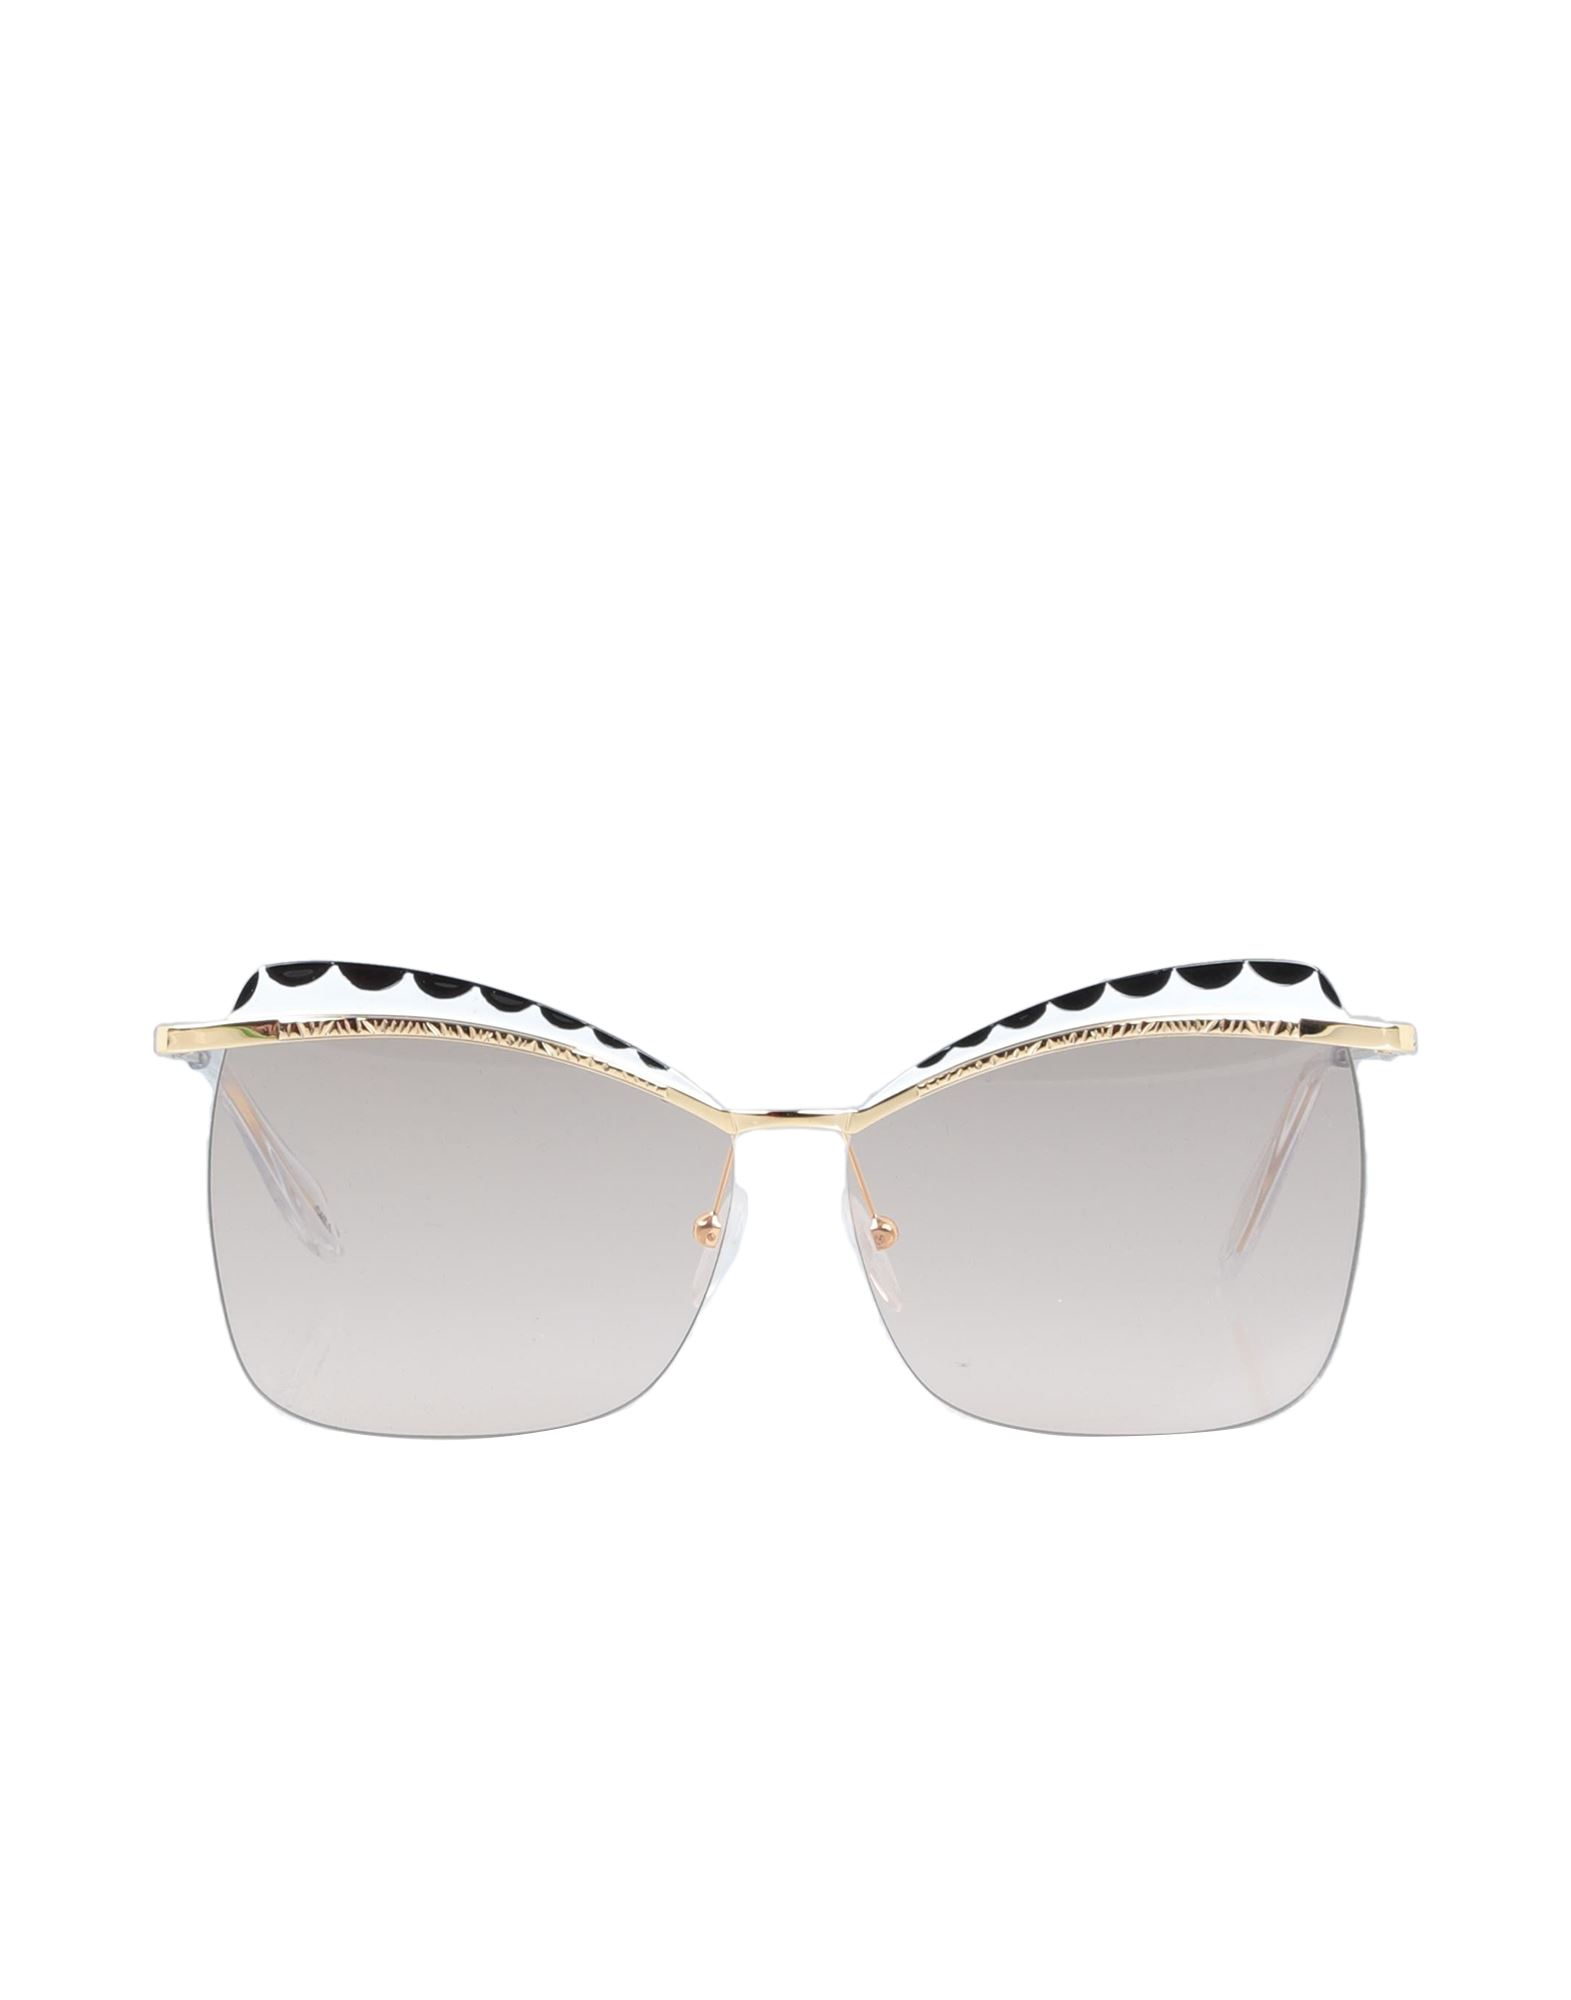 ALEXANDER MCQUEEN Sunglasses - Item 46735197